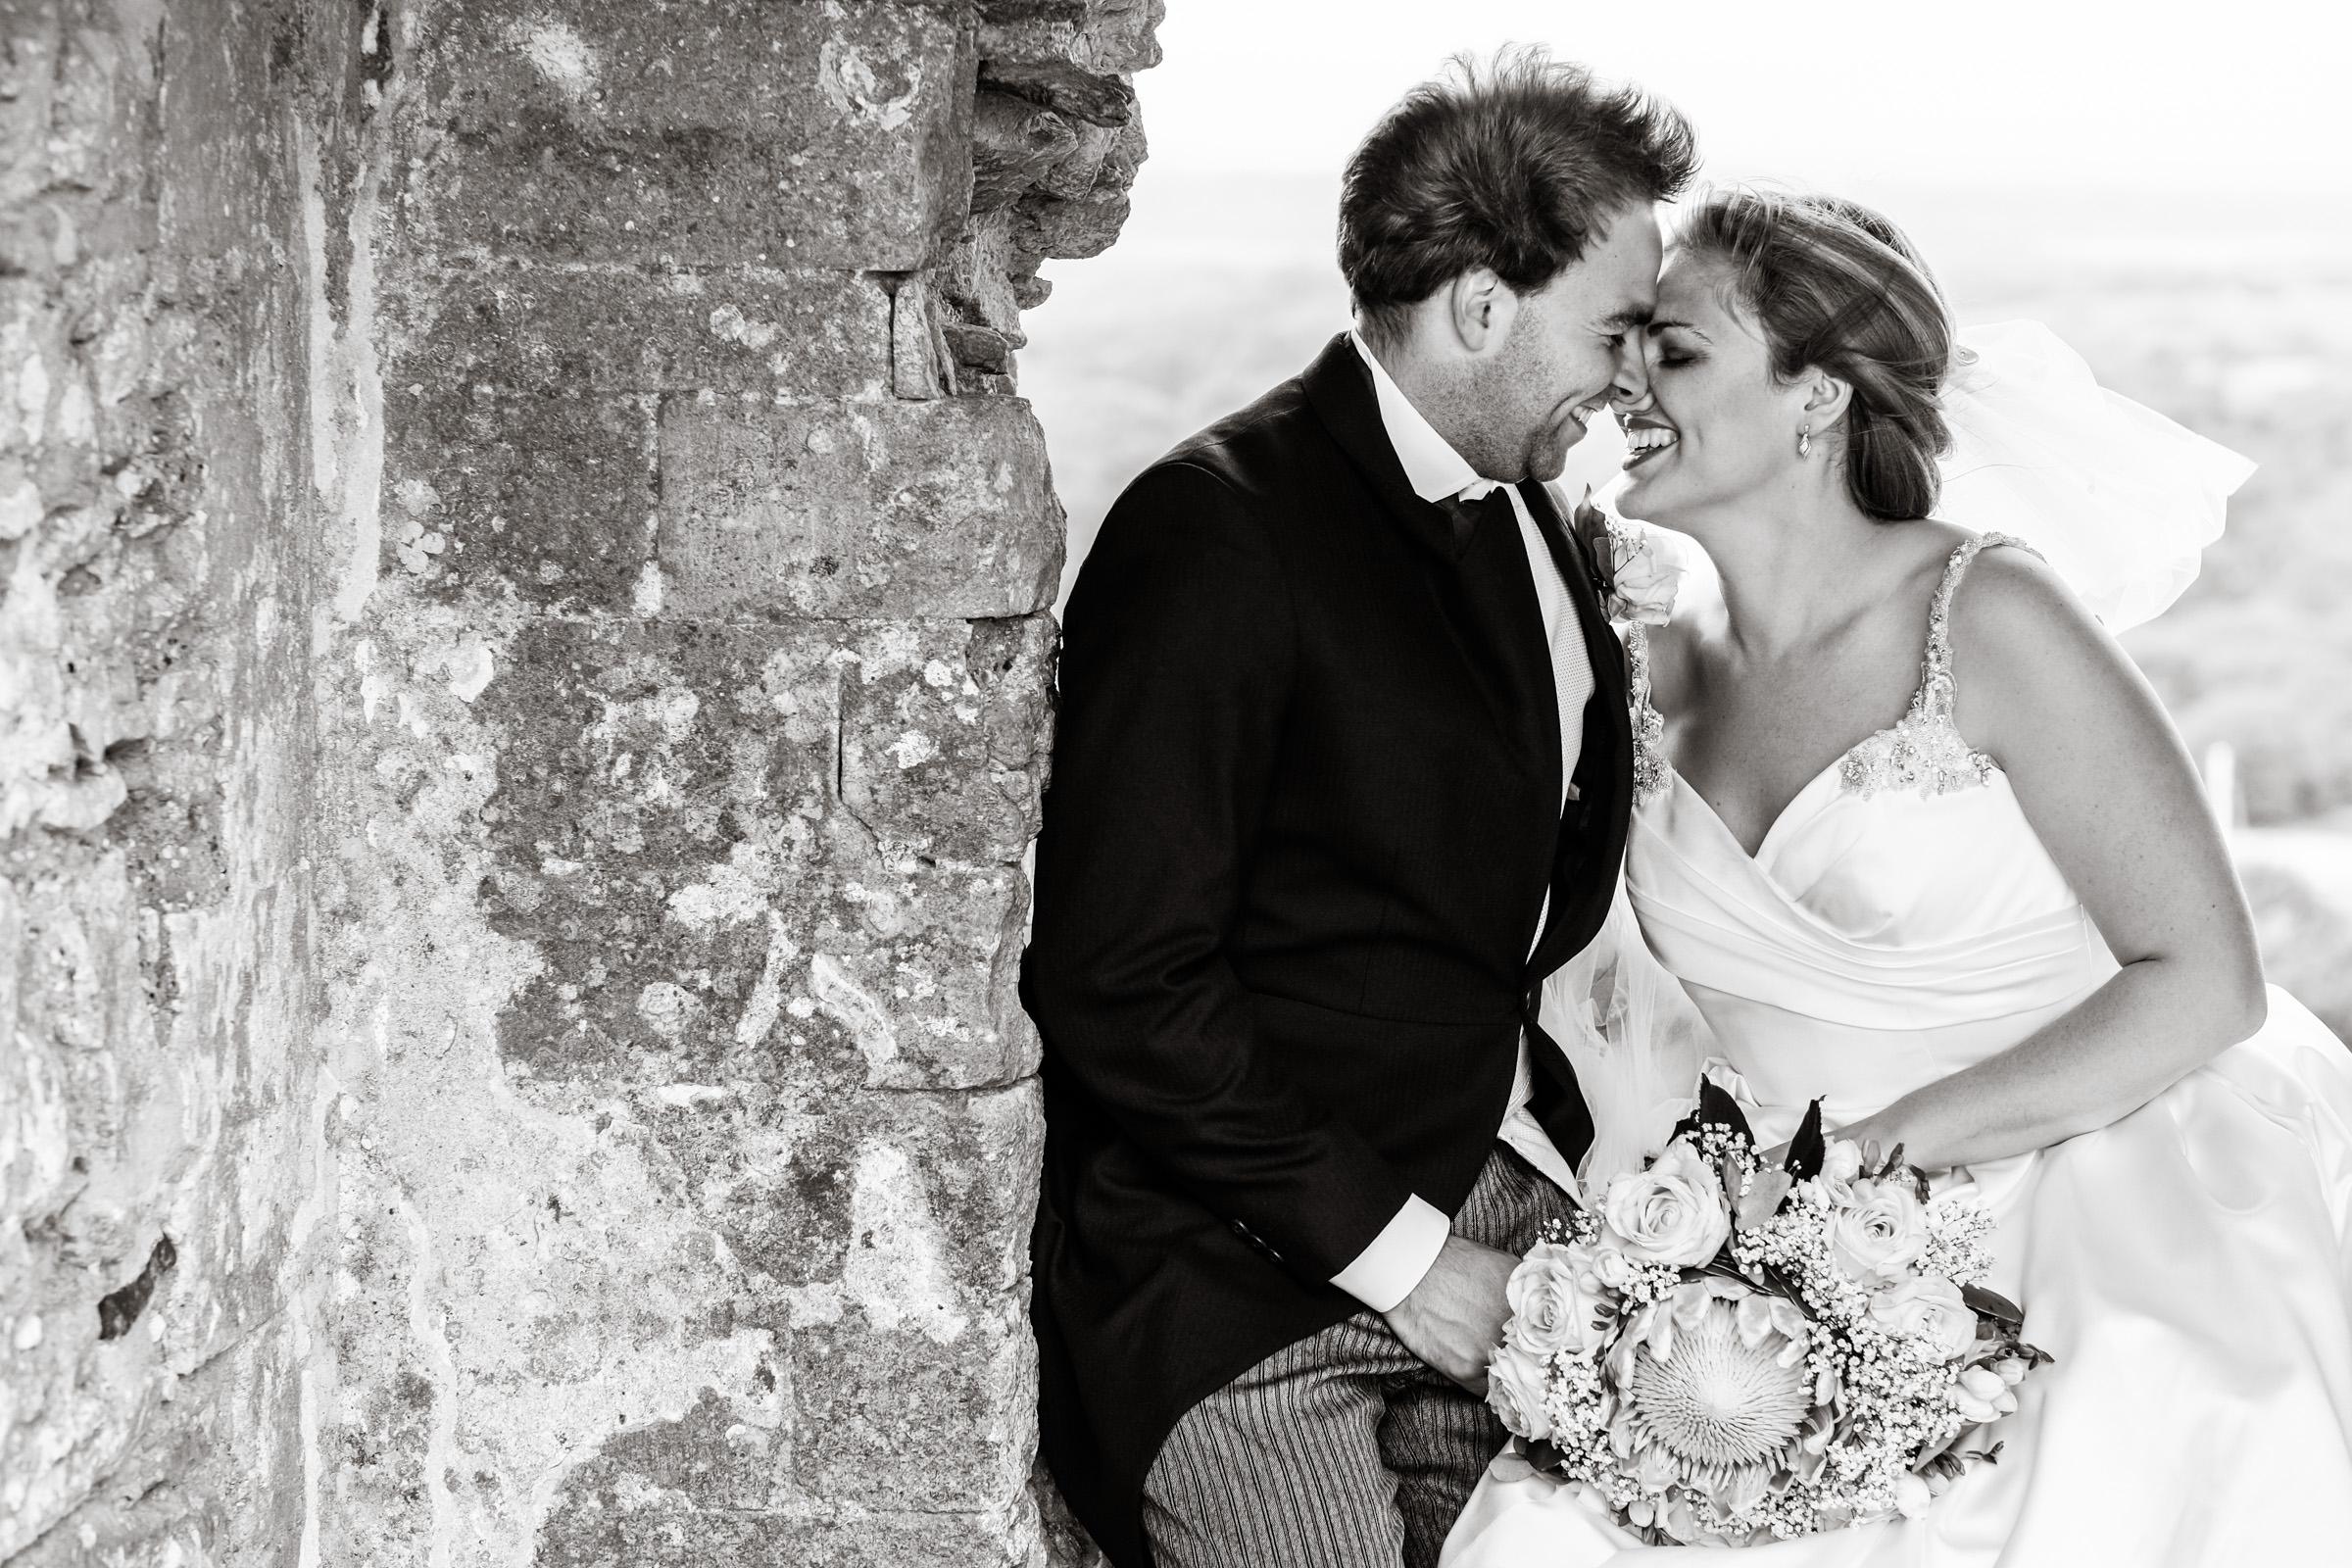 Natural+wedding+photography+portfolio+111.jpg